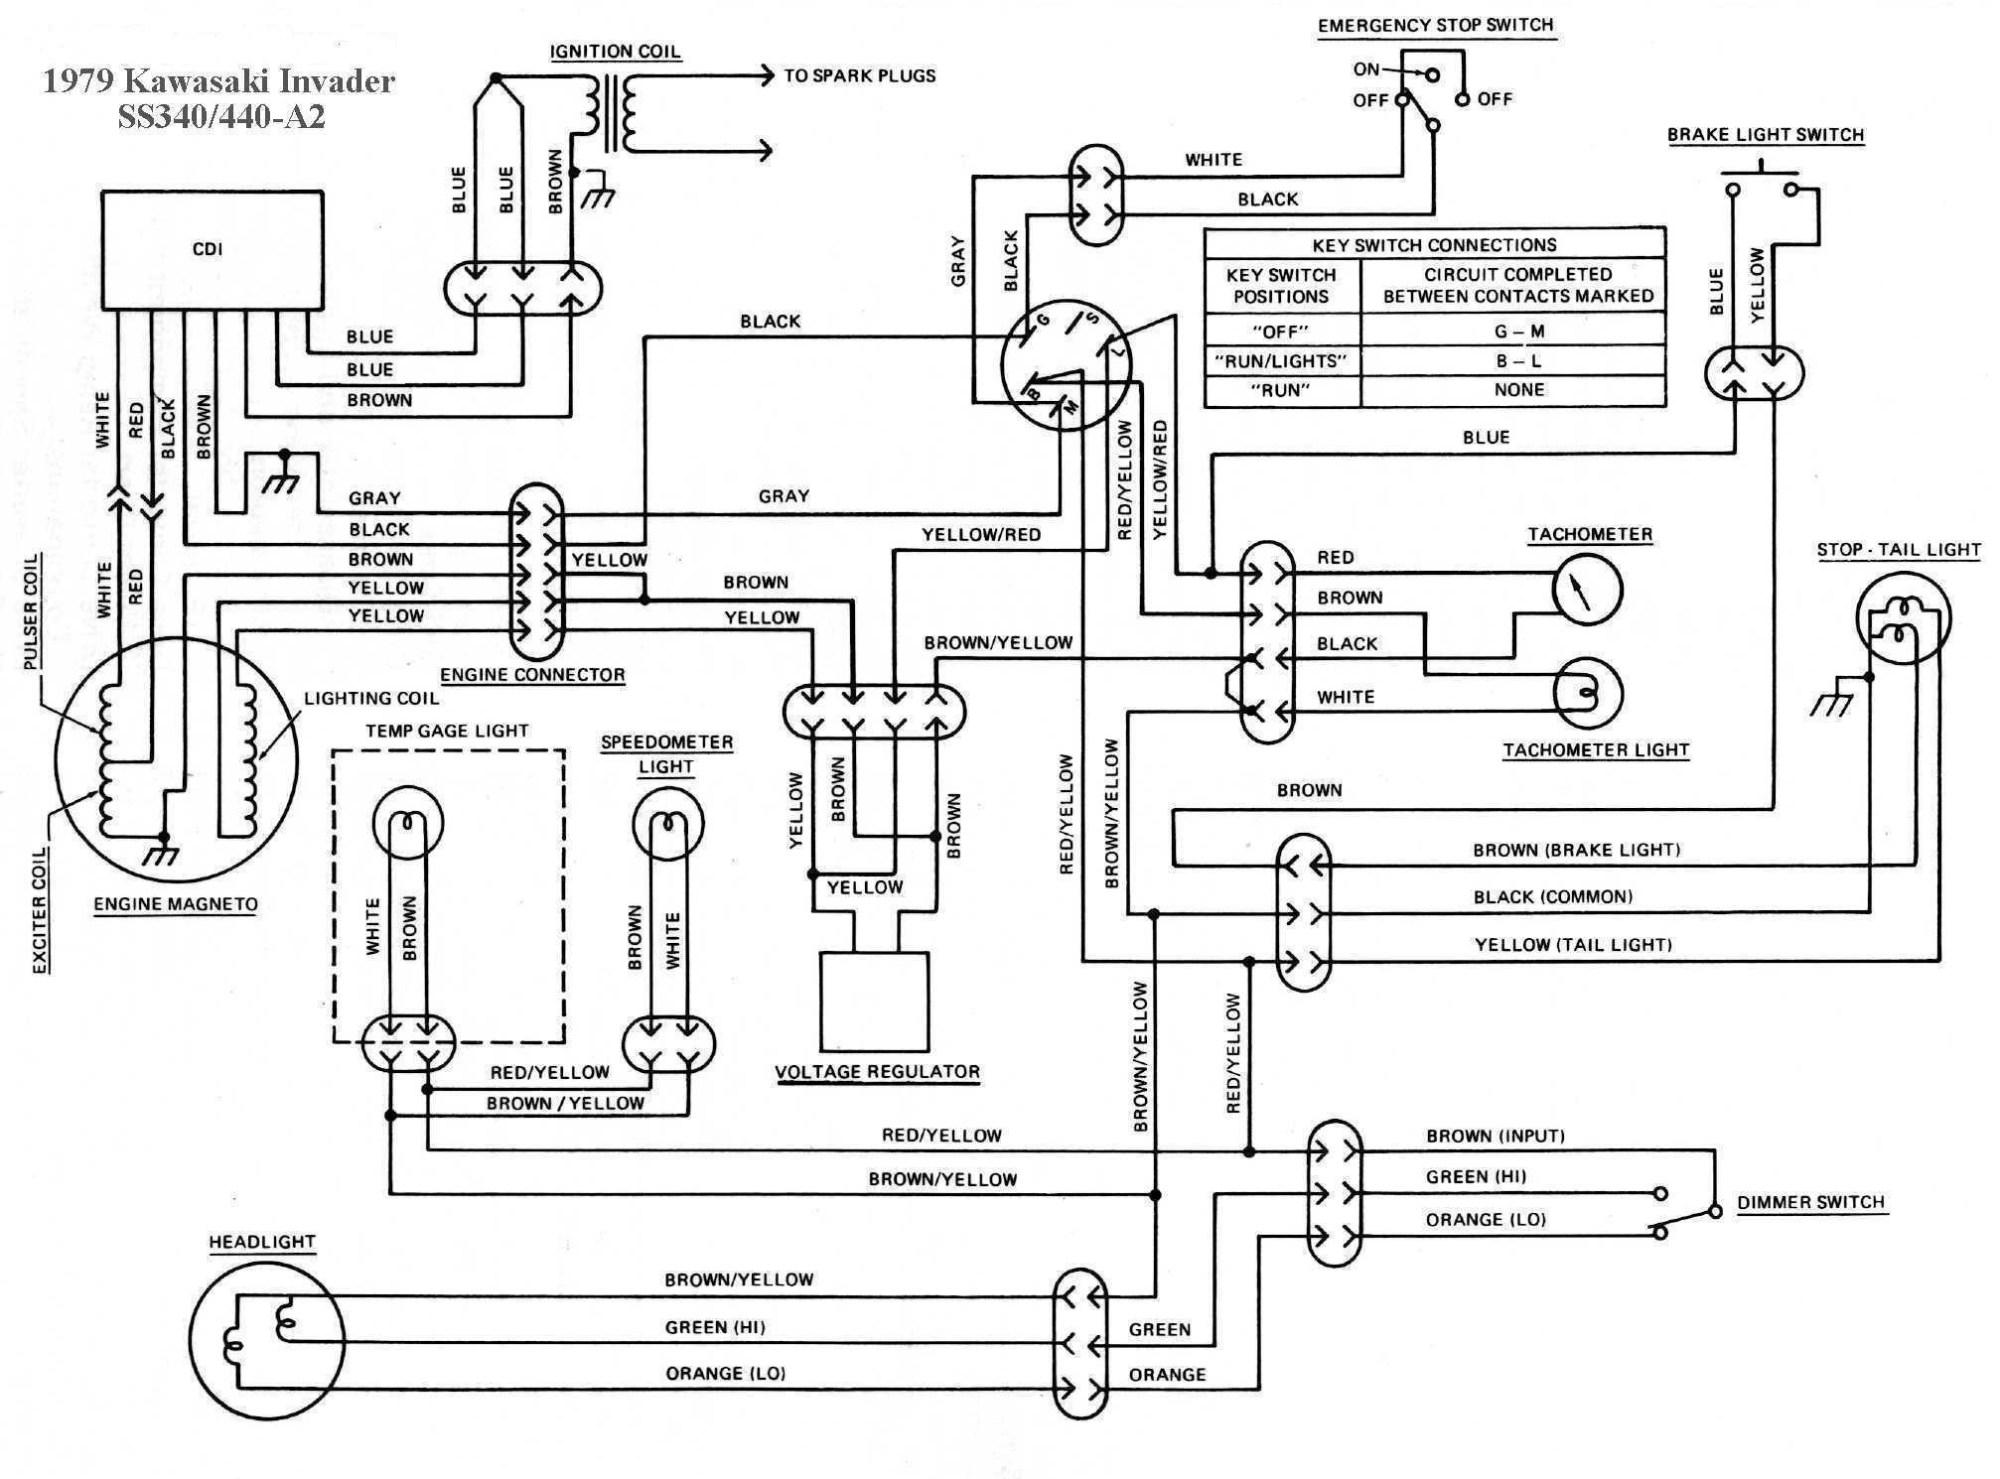 hight resolution of kawasaki bayou 220 wiring schematic wiring diagram kawasaki bayou 220 awesome new 1990 kawasaki bayou